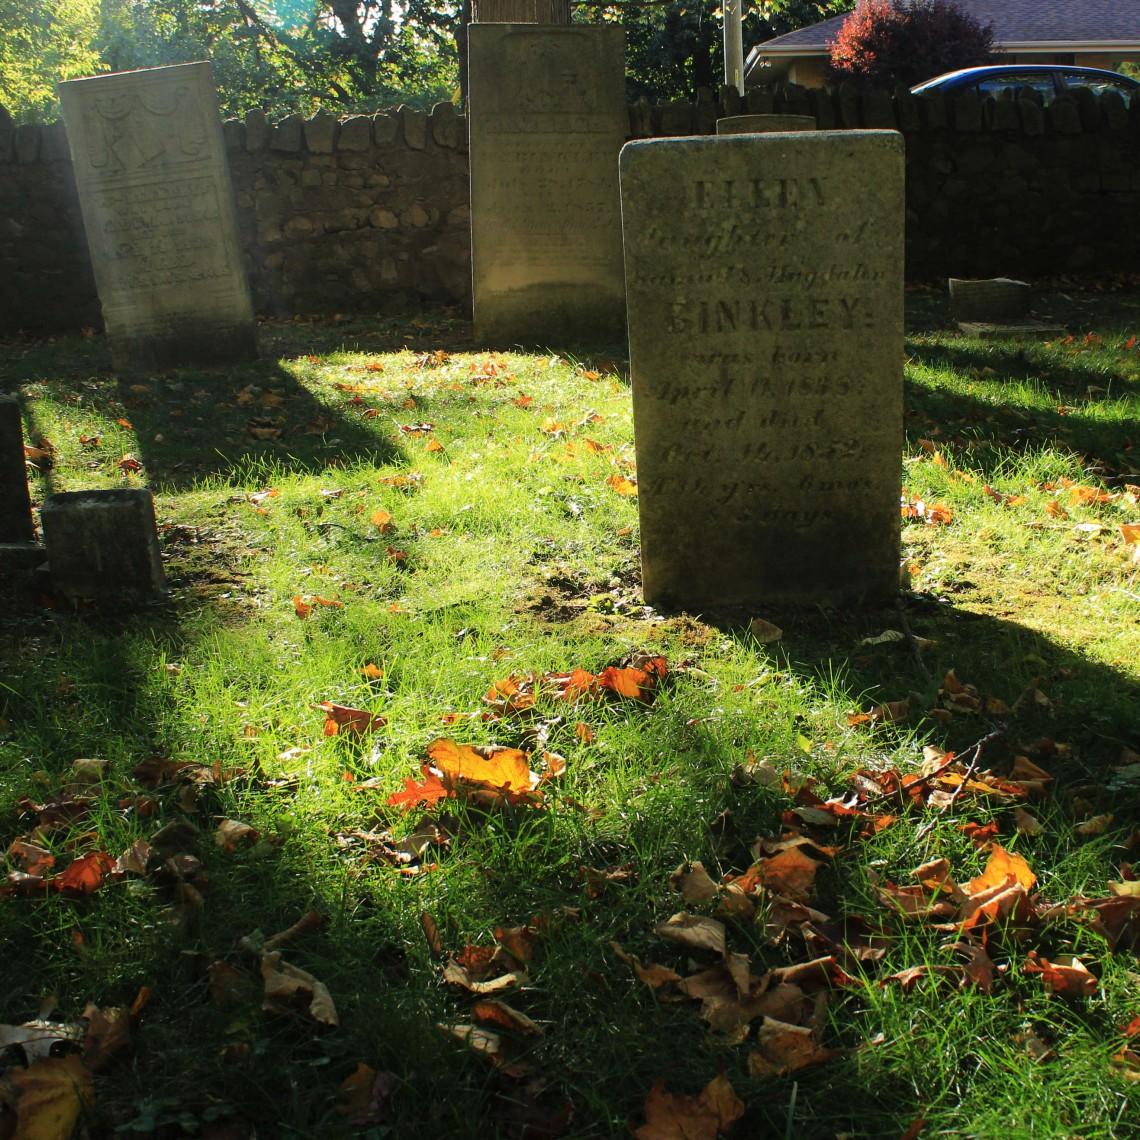 Binkley Hallow Graveyard, Hamilton (Ont) . Photo by @erskinec